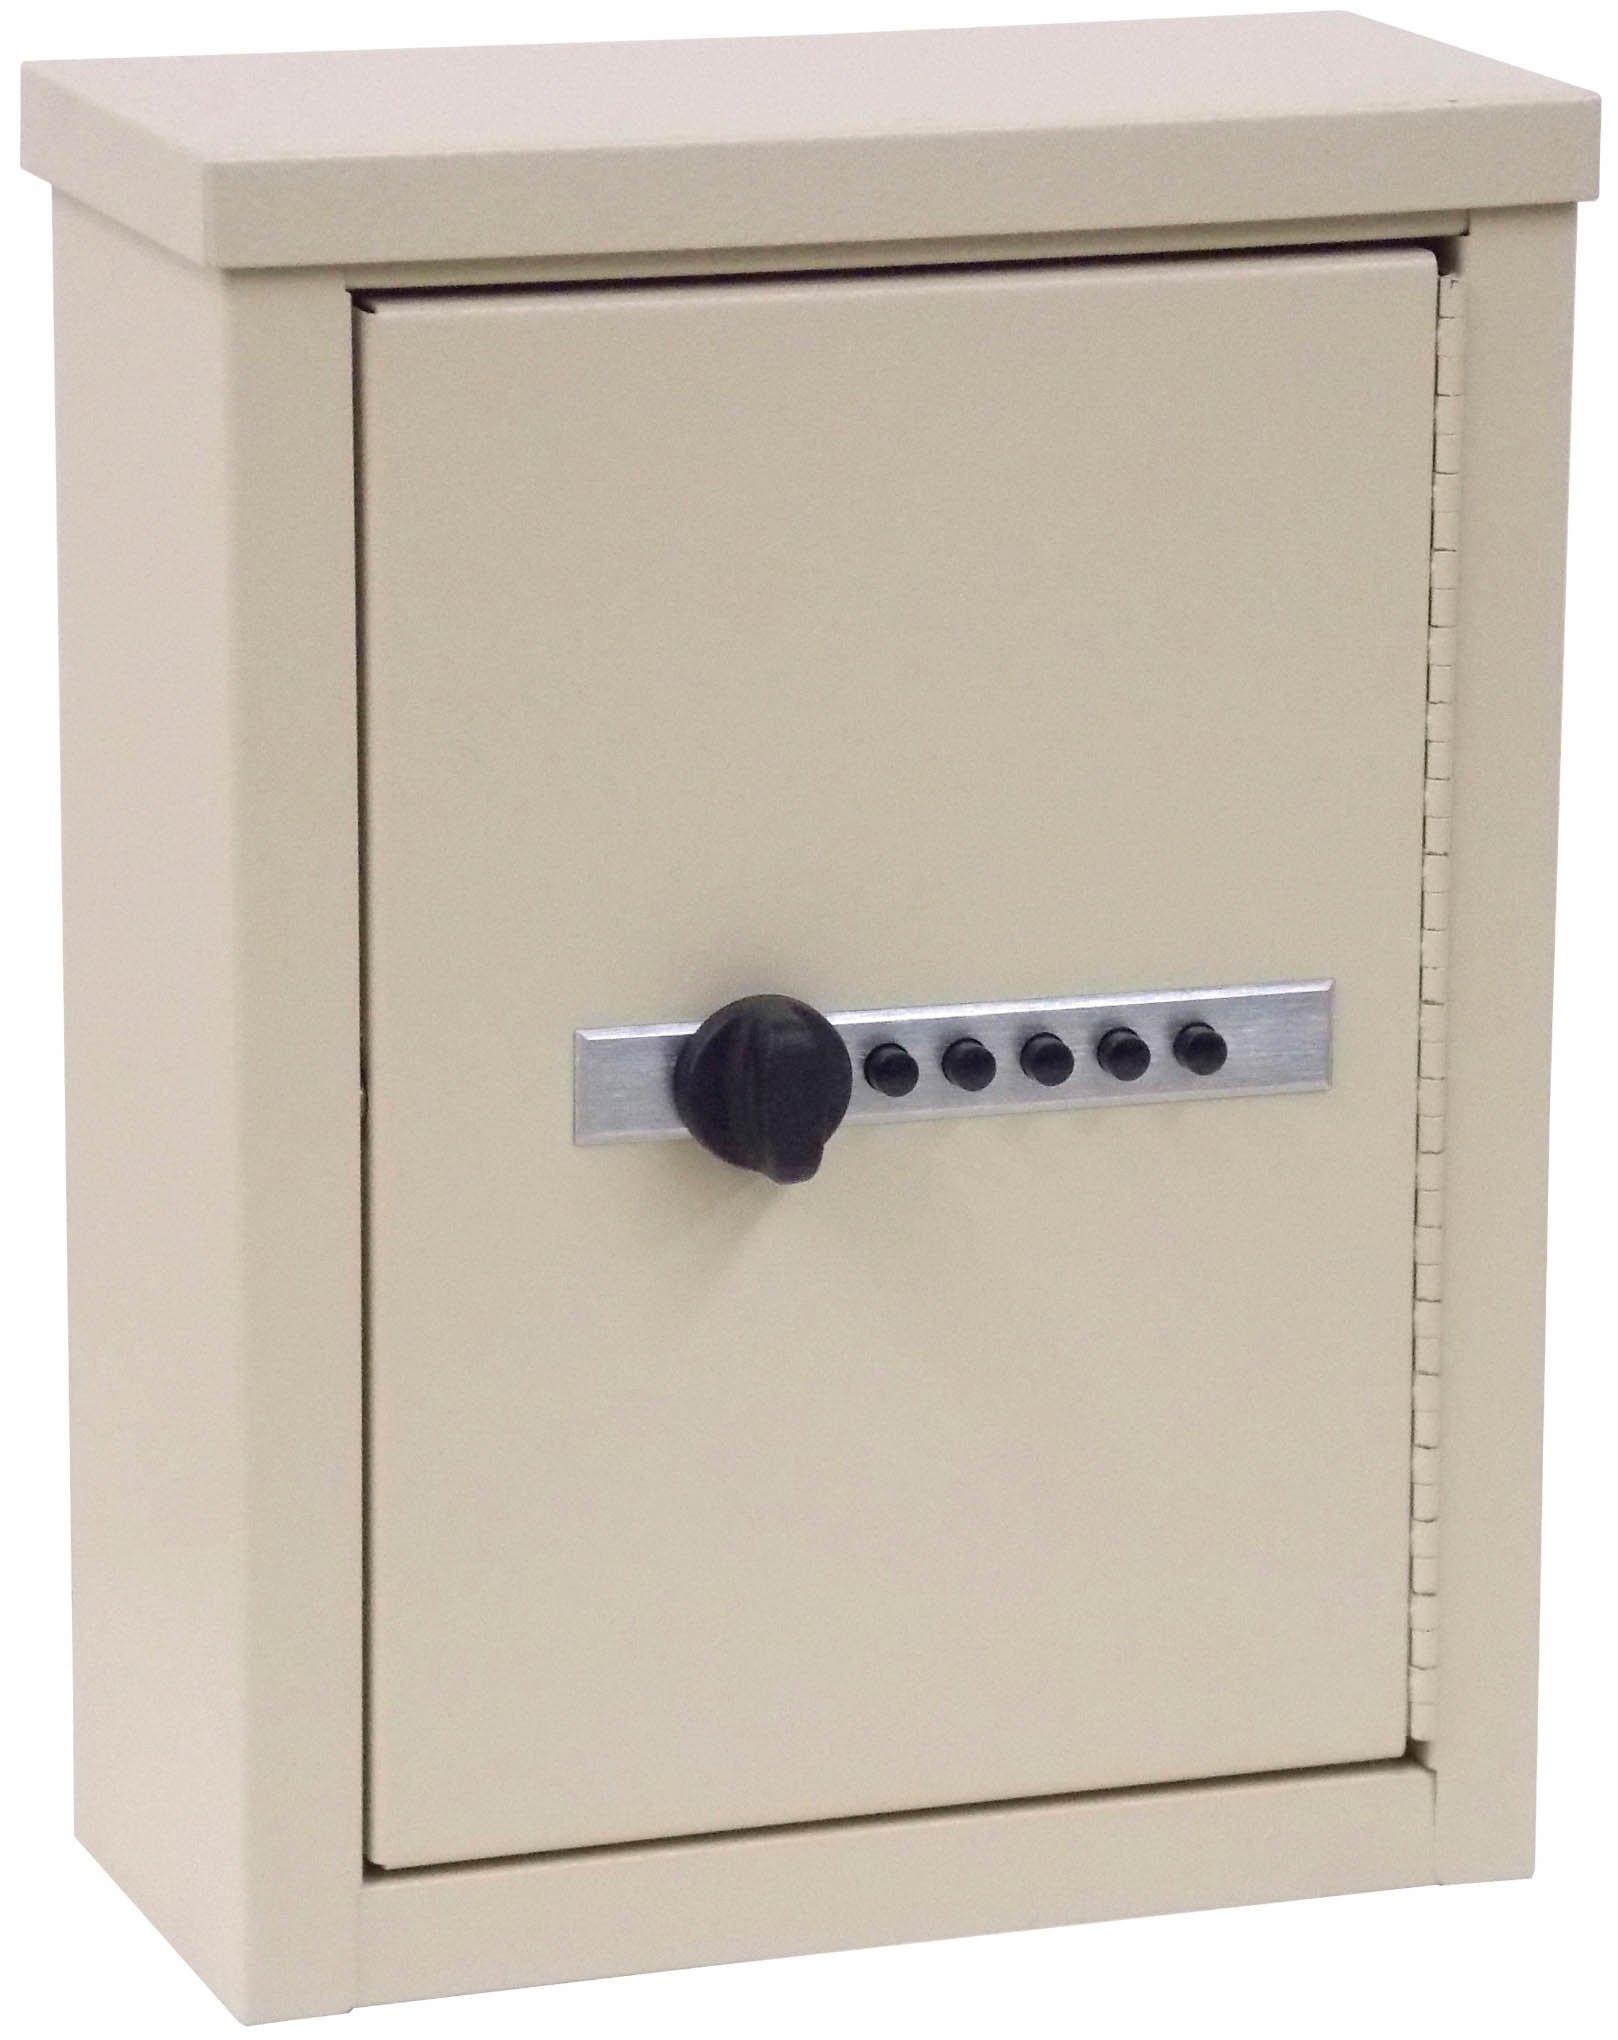 Mini Wall Storage Cabinet with Combination Lock - Beige